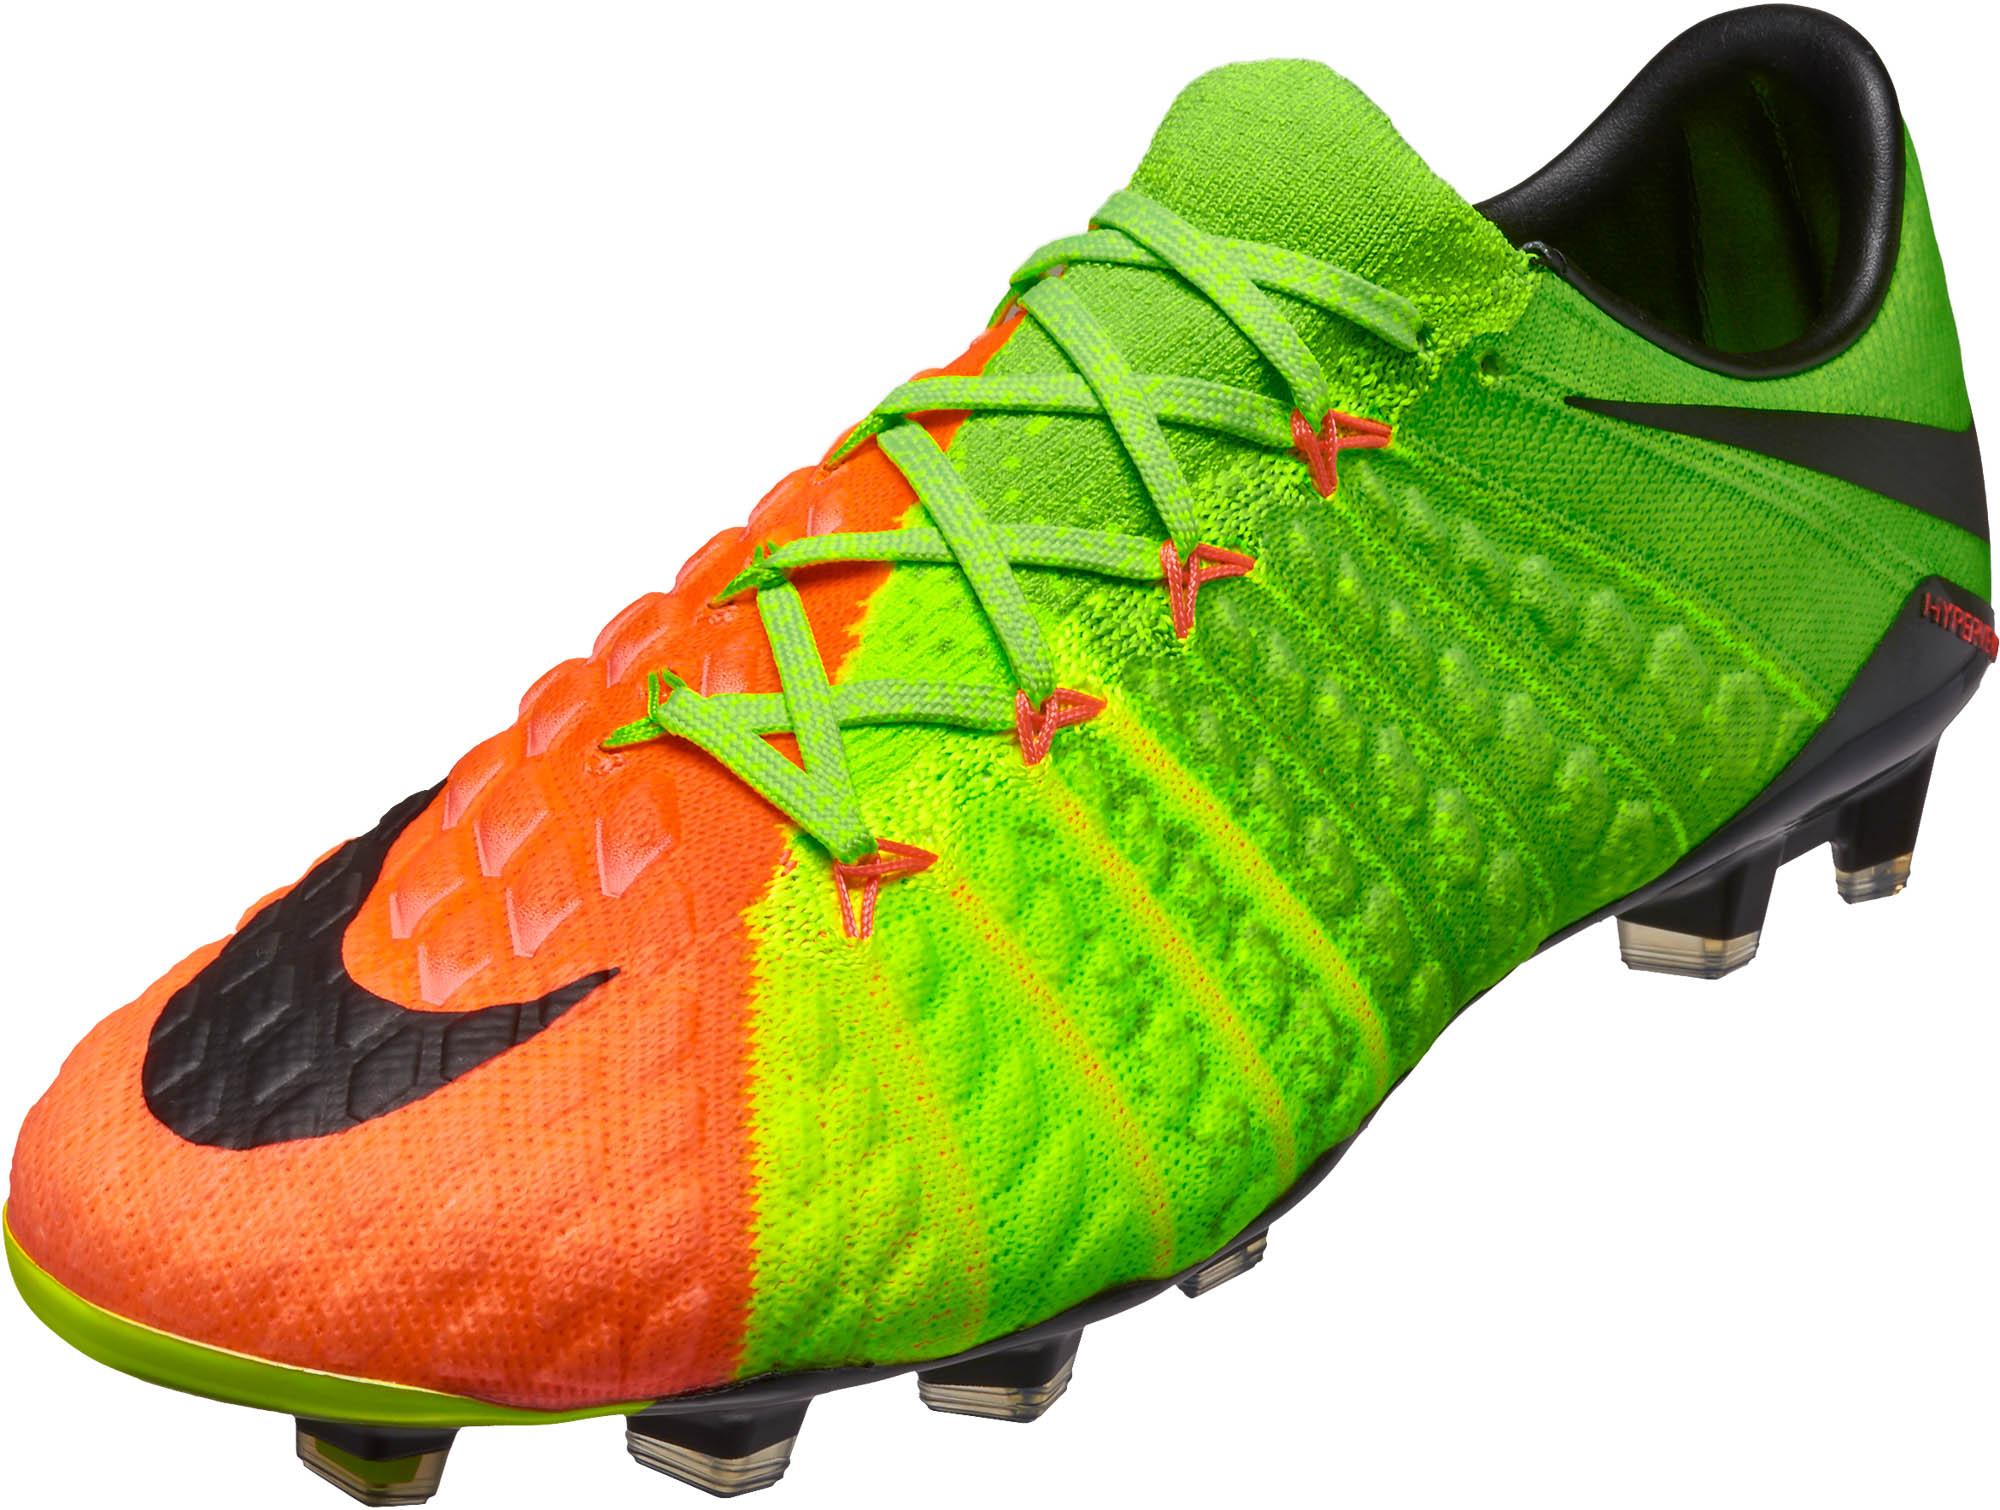 72703a38569 Nike Hypervenom Phantom III FG Soccer Cleats - Electric Green ...